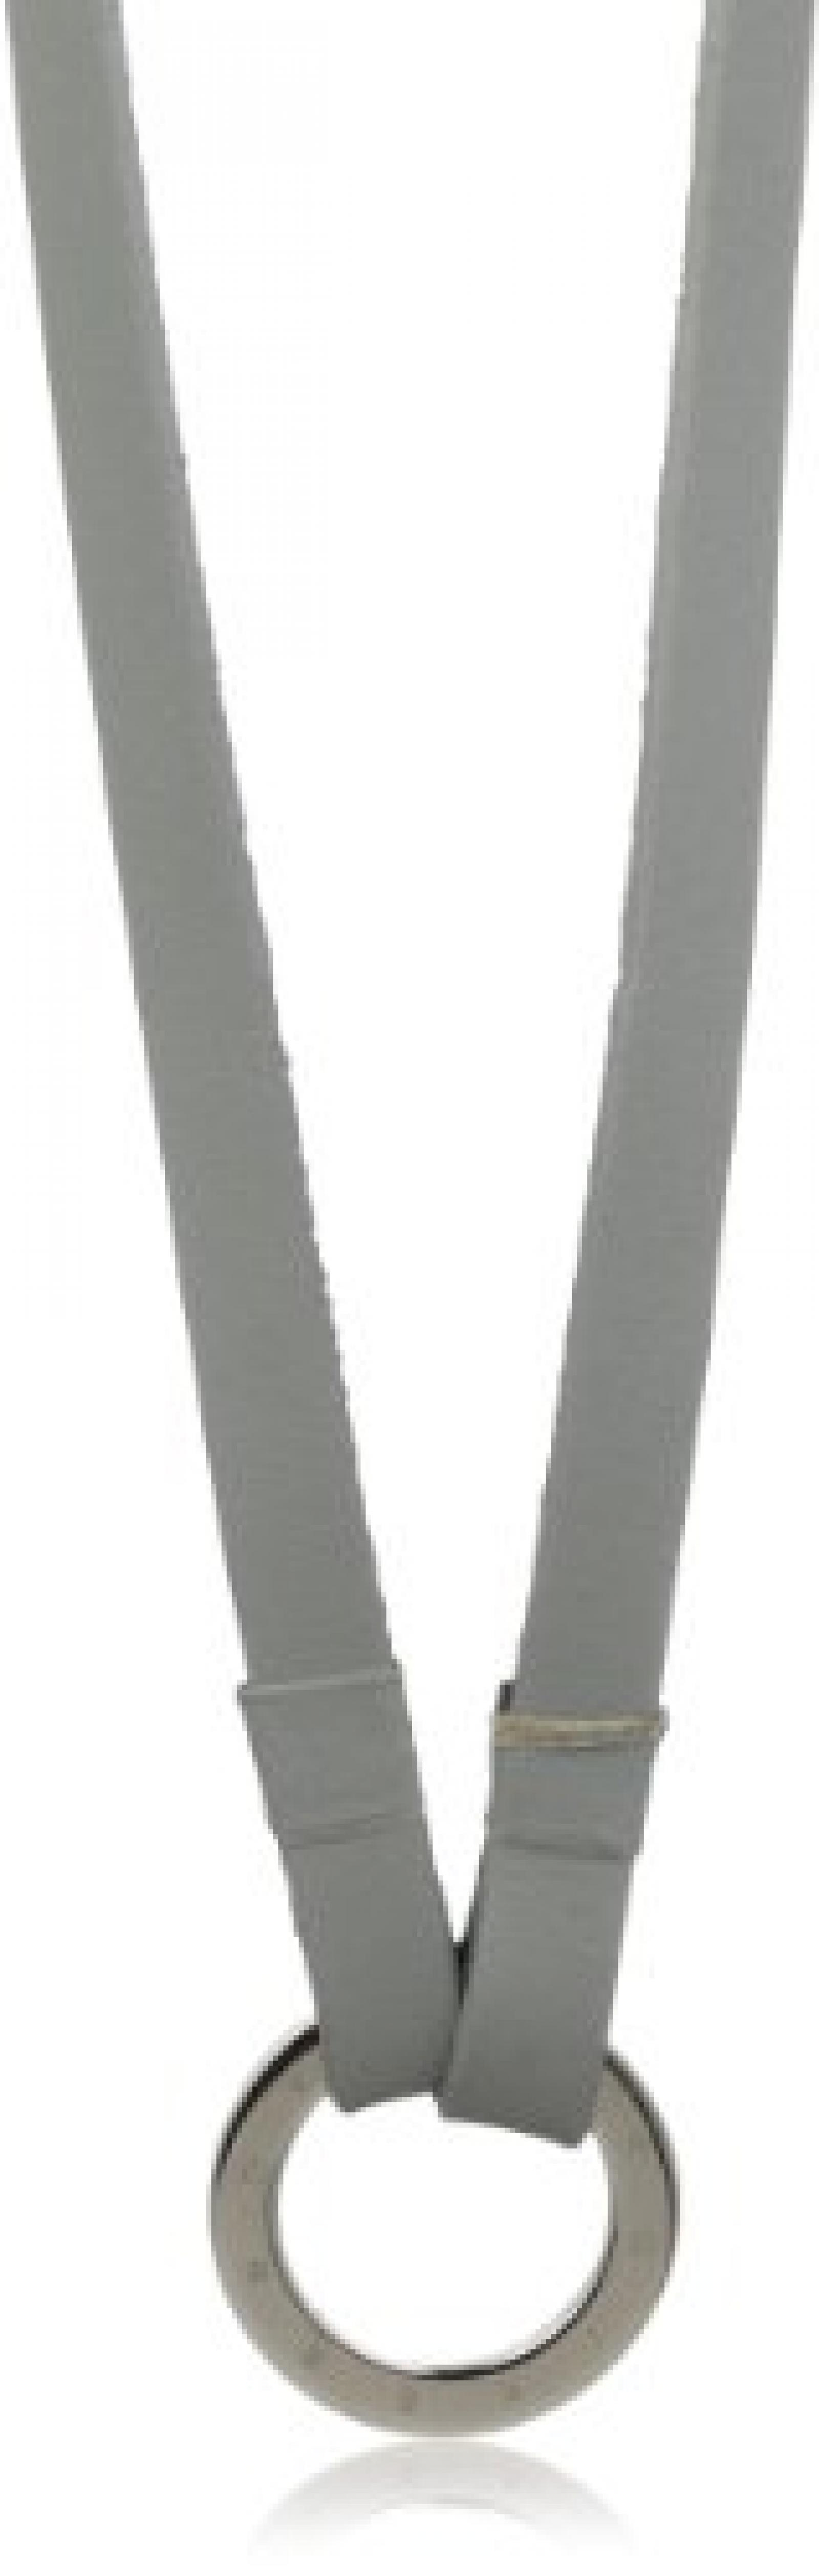 Dyrberg/Kern Damen-Lederhalskette GIMME SS GREY 80cm 332354